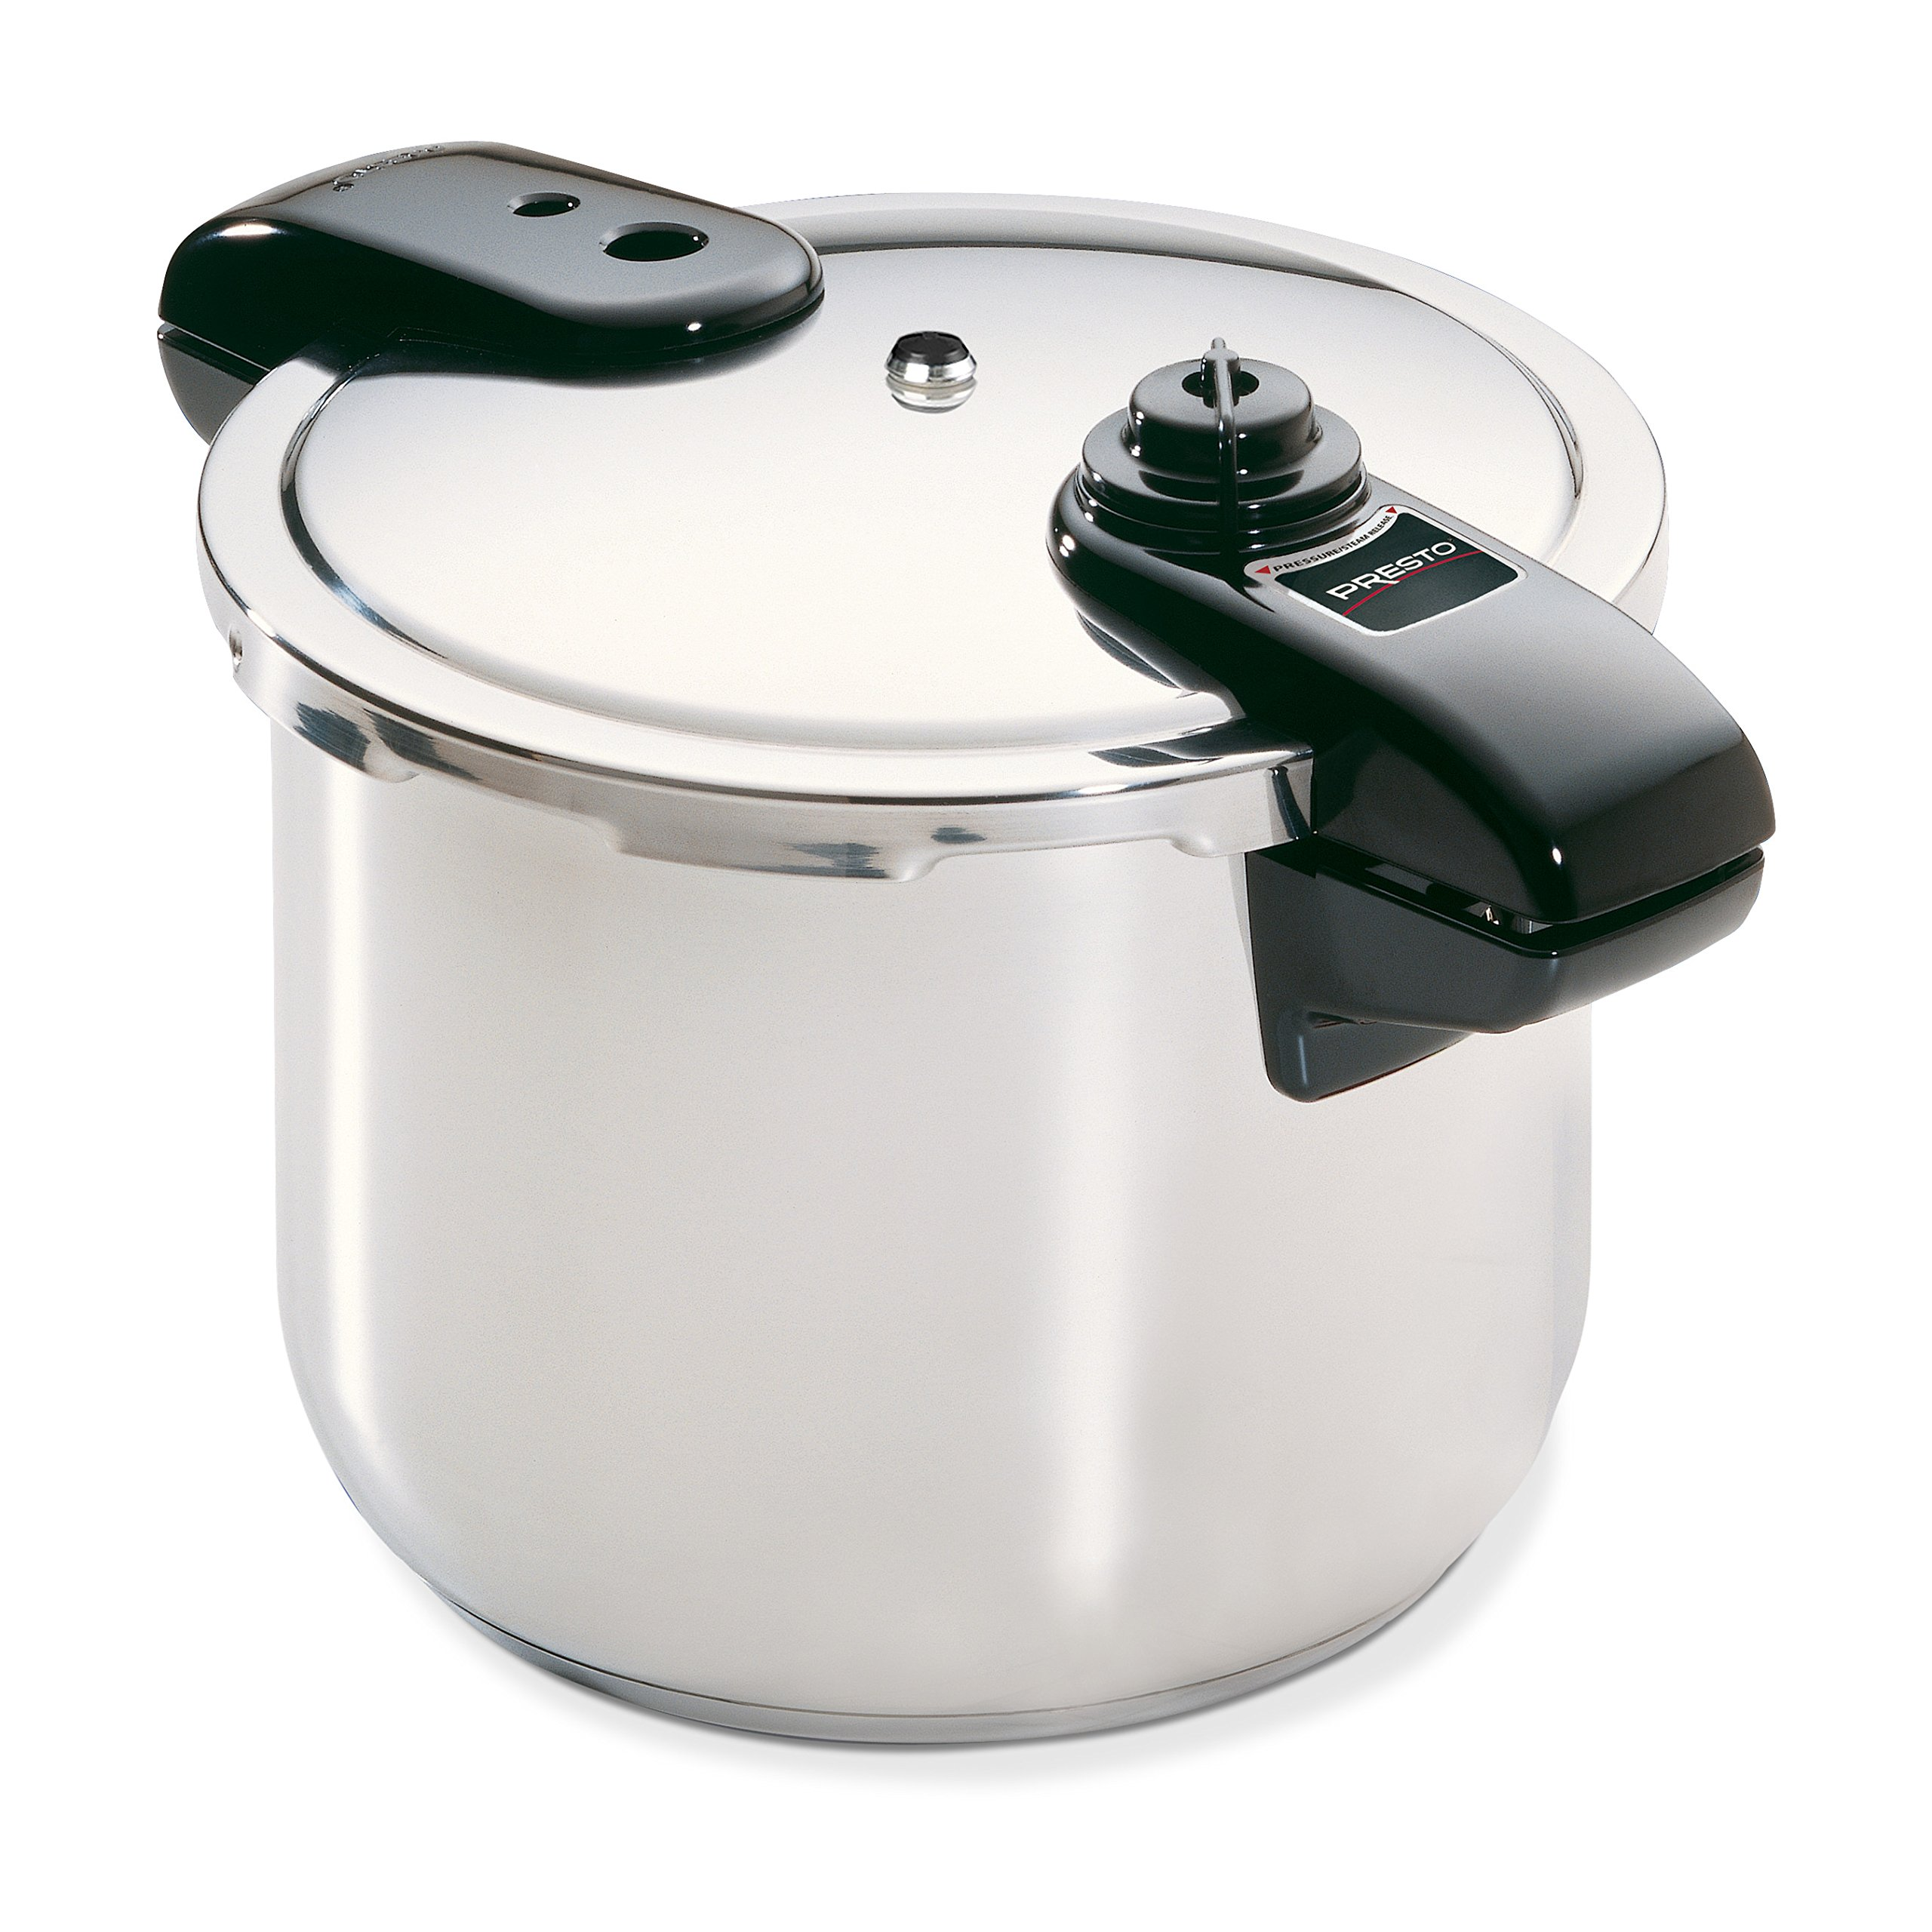 Presto 01370 8-Quart Stainless Steel Pressure Cooker by Presto